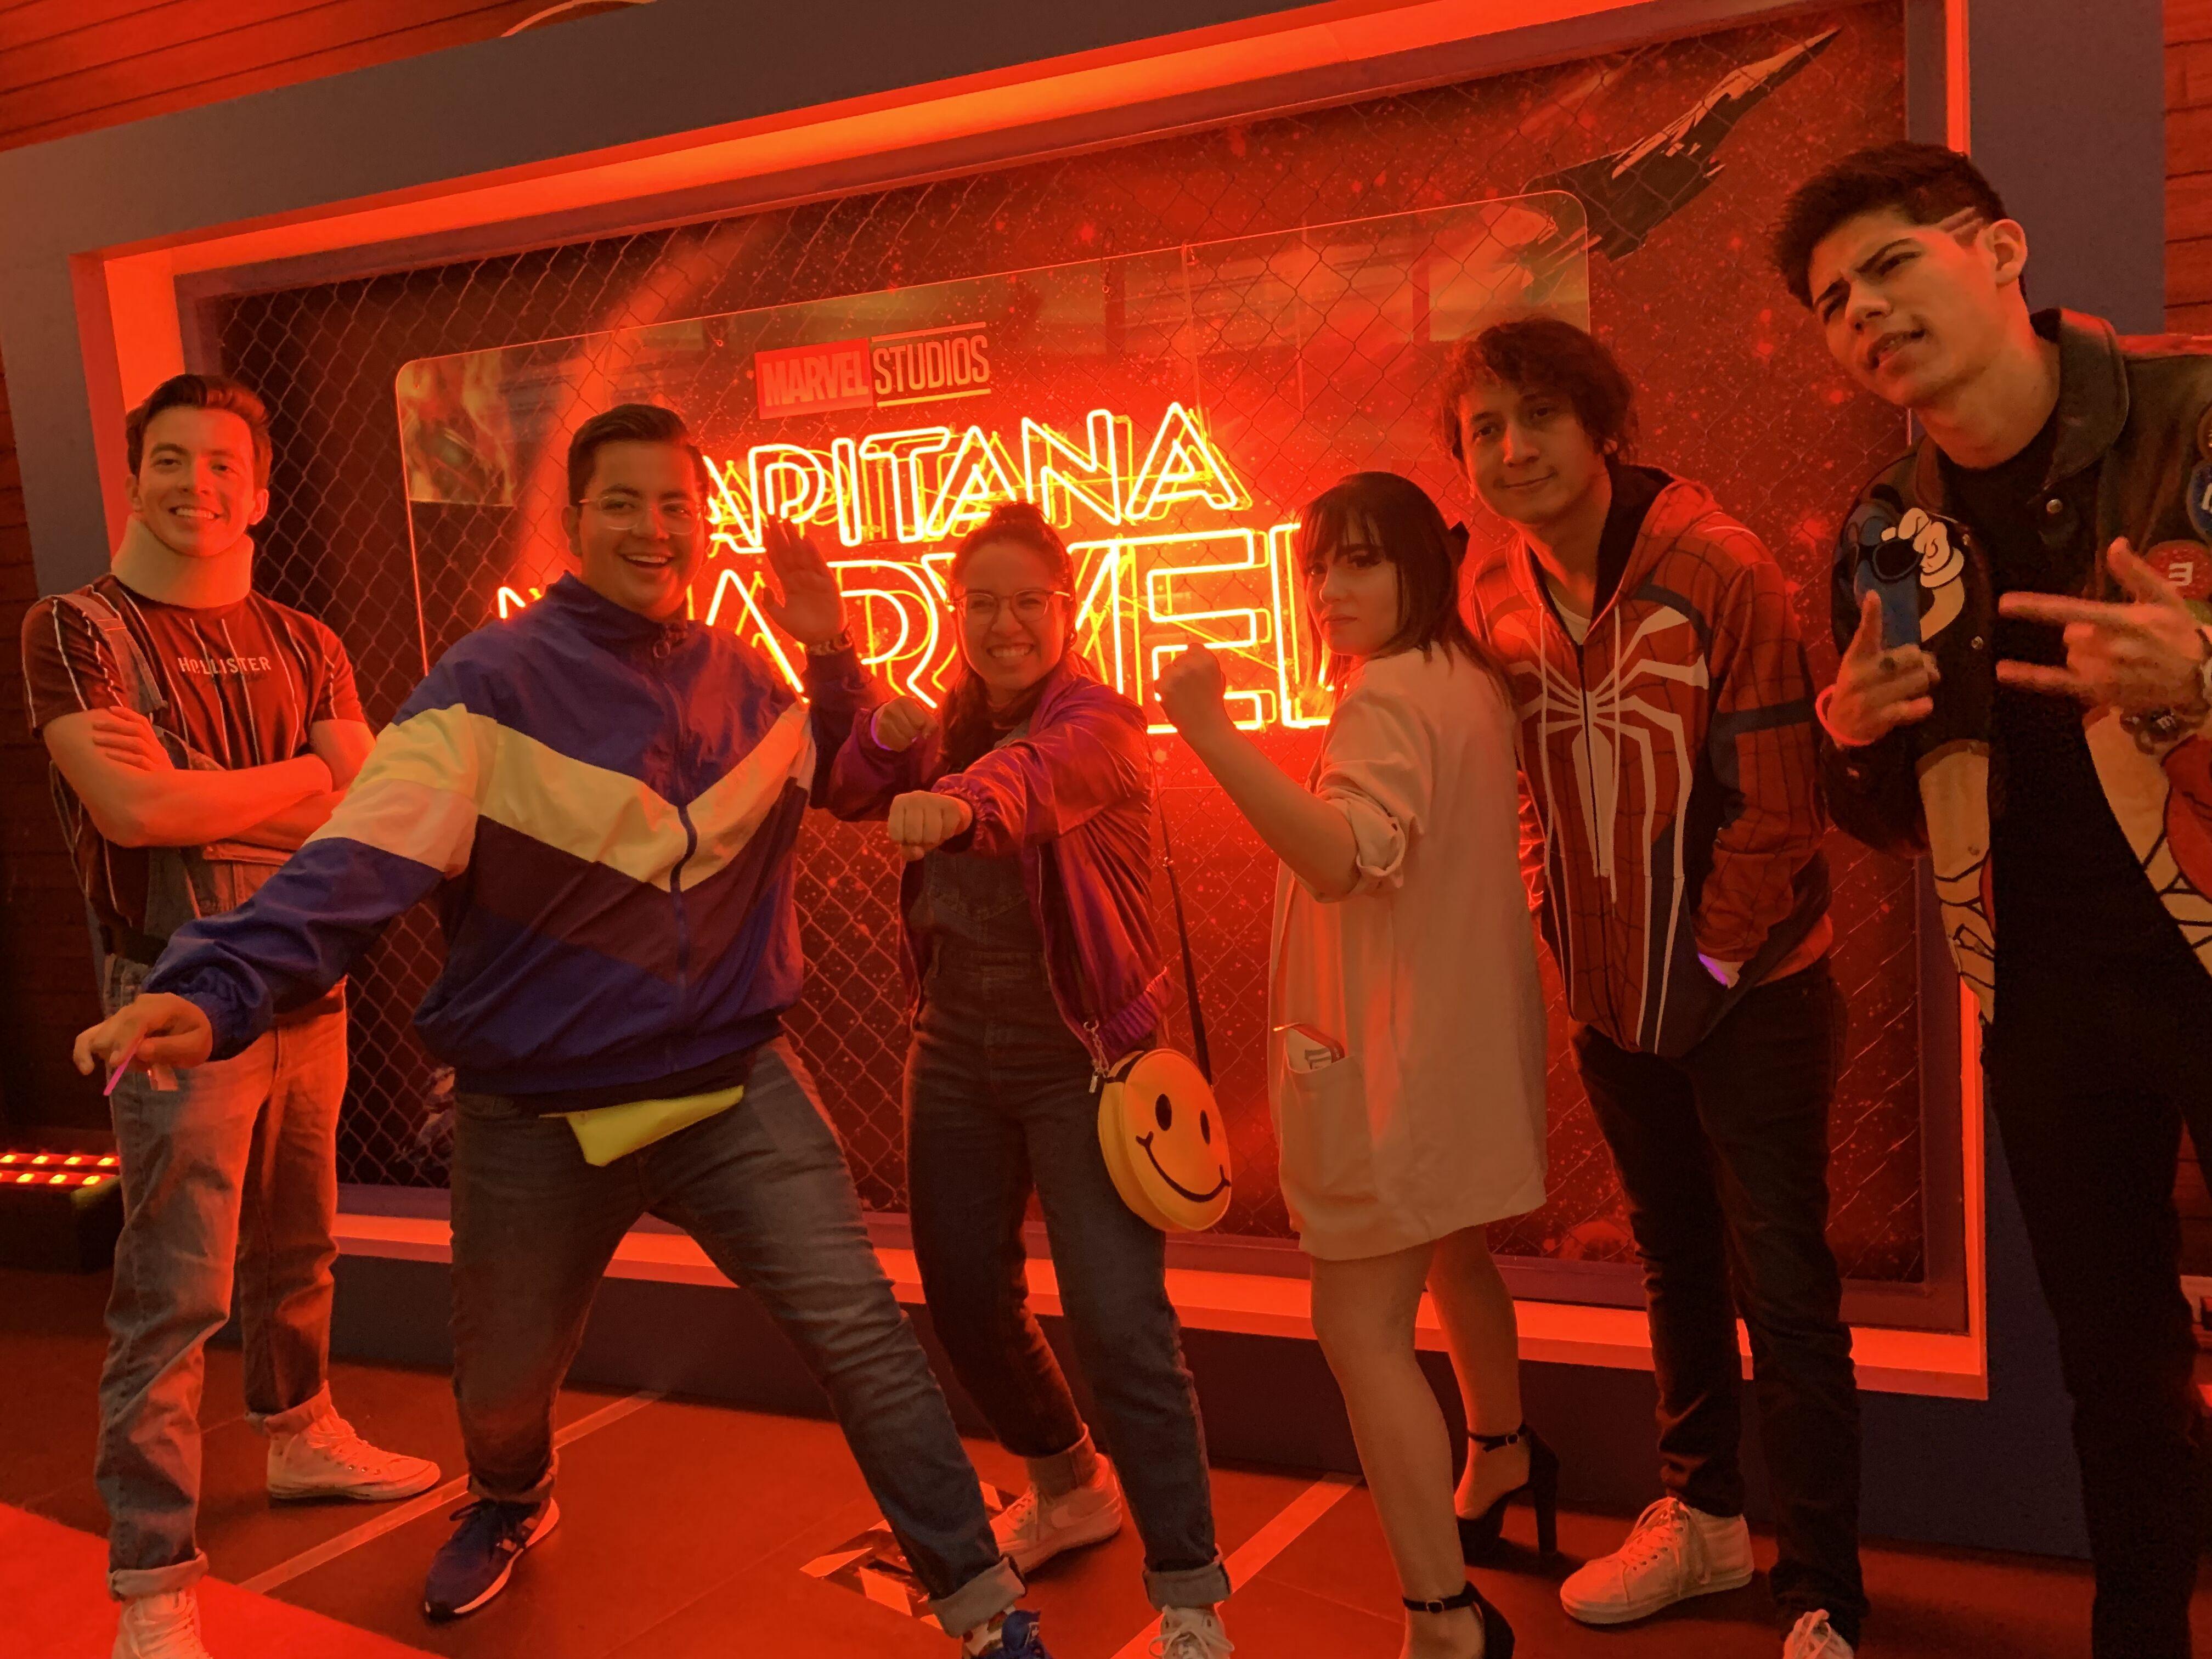 A mis amigos de Youtube y a mi nos invitaron al estreno de Capitana América, fue muy divertido | My friends from YouTube and I were invited to the premiere of Capitana América, it was very fun